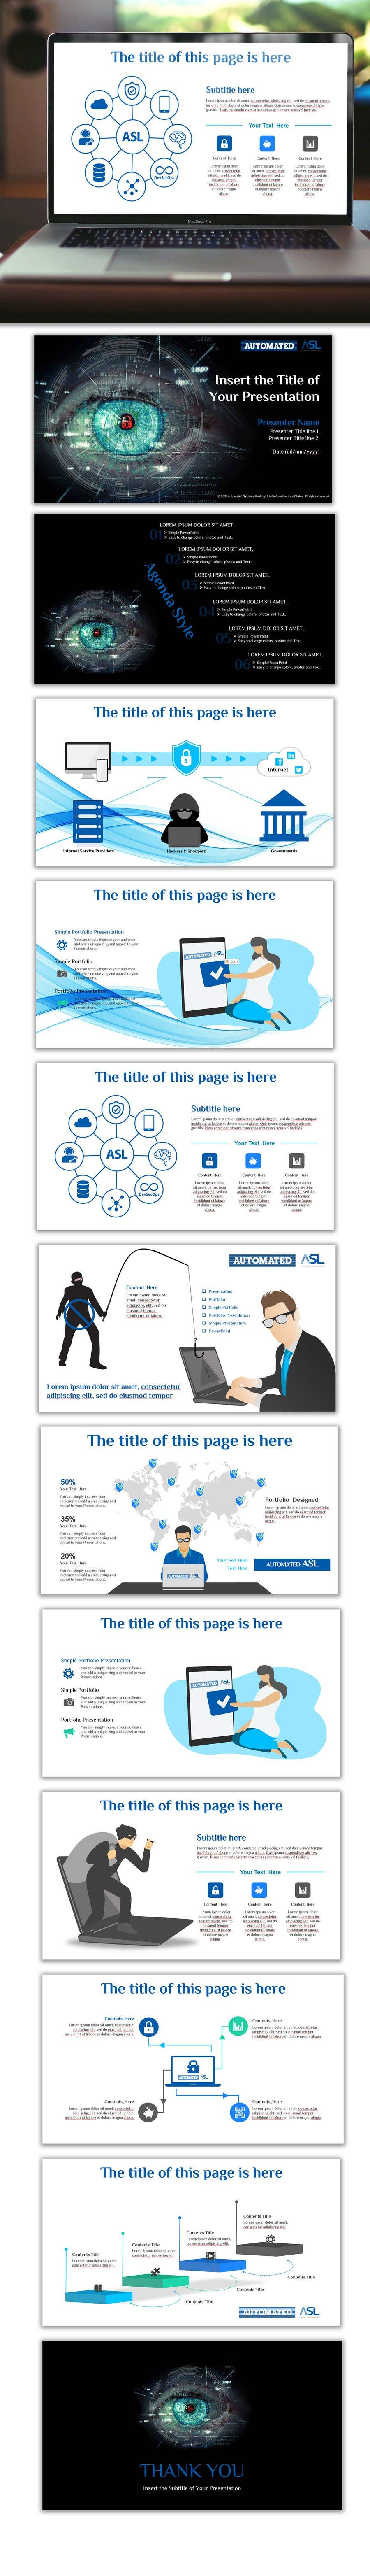 Bài tham dự cuộc thi #                                        5                                      cho                                         Corporate PPT Template Design (6 slides)